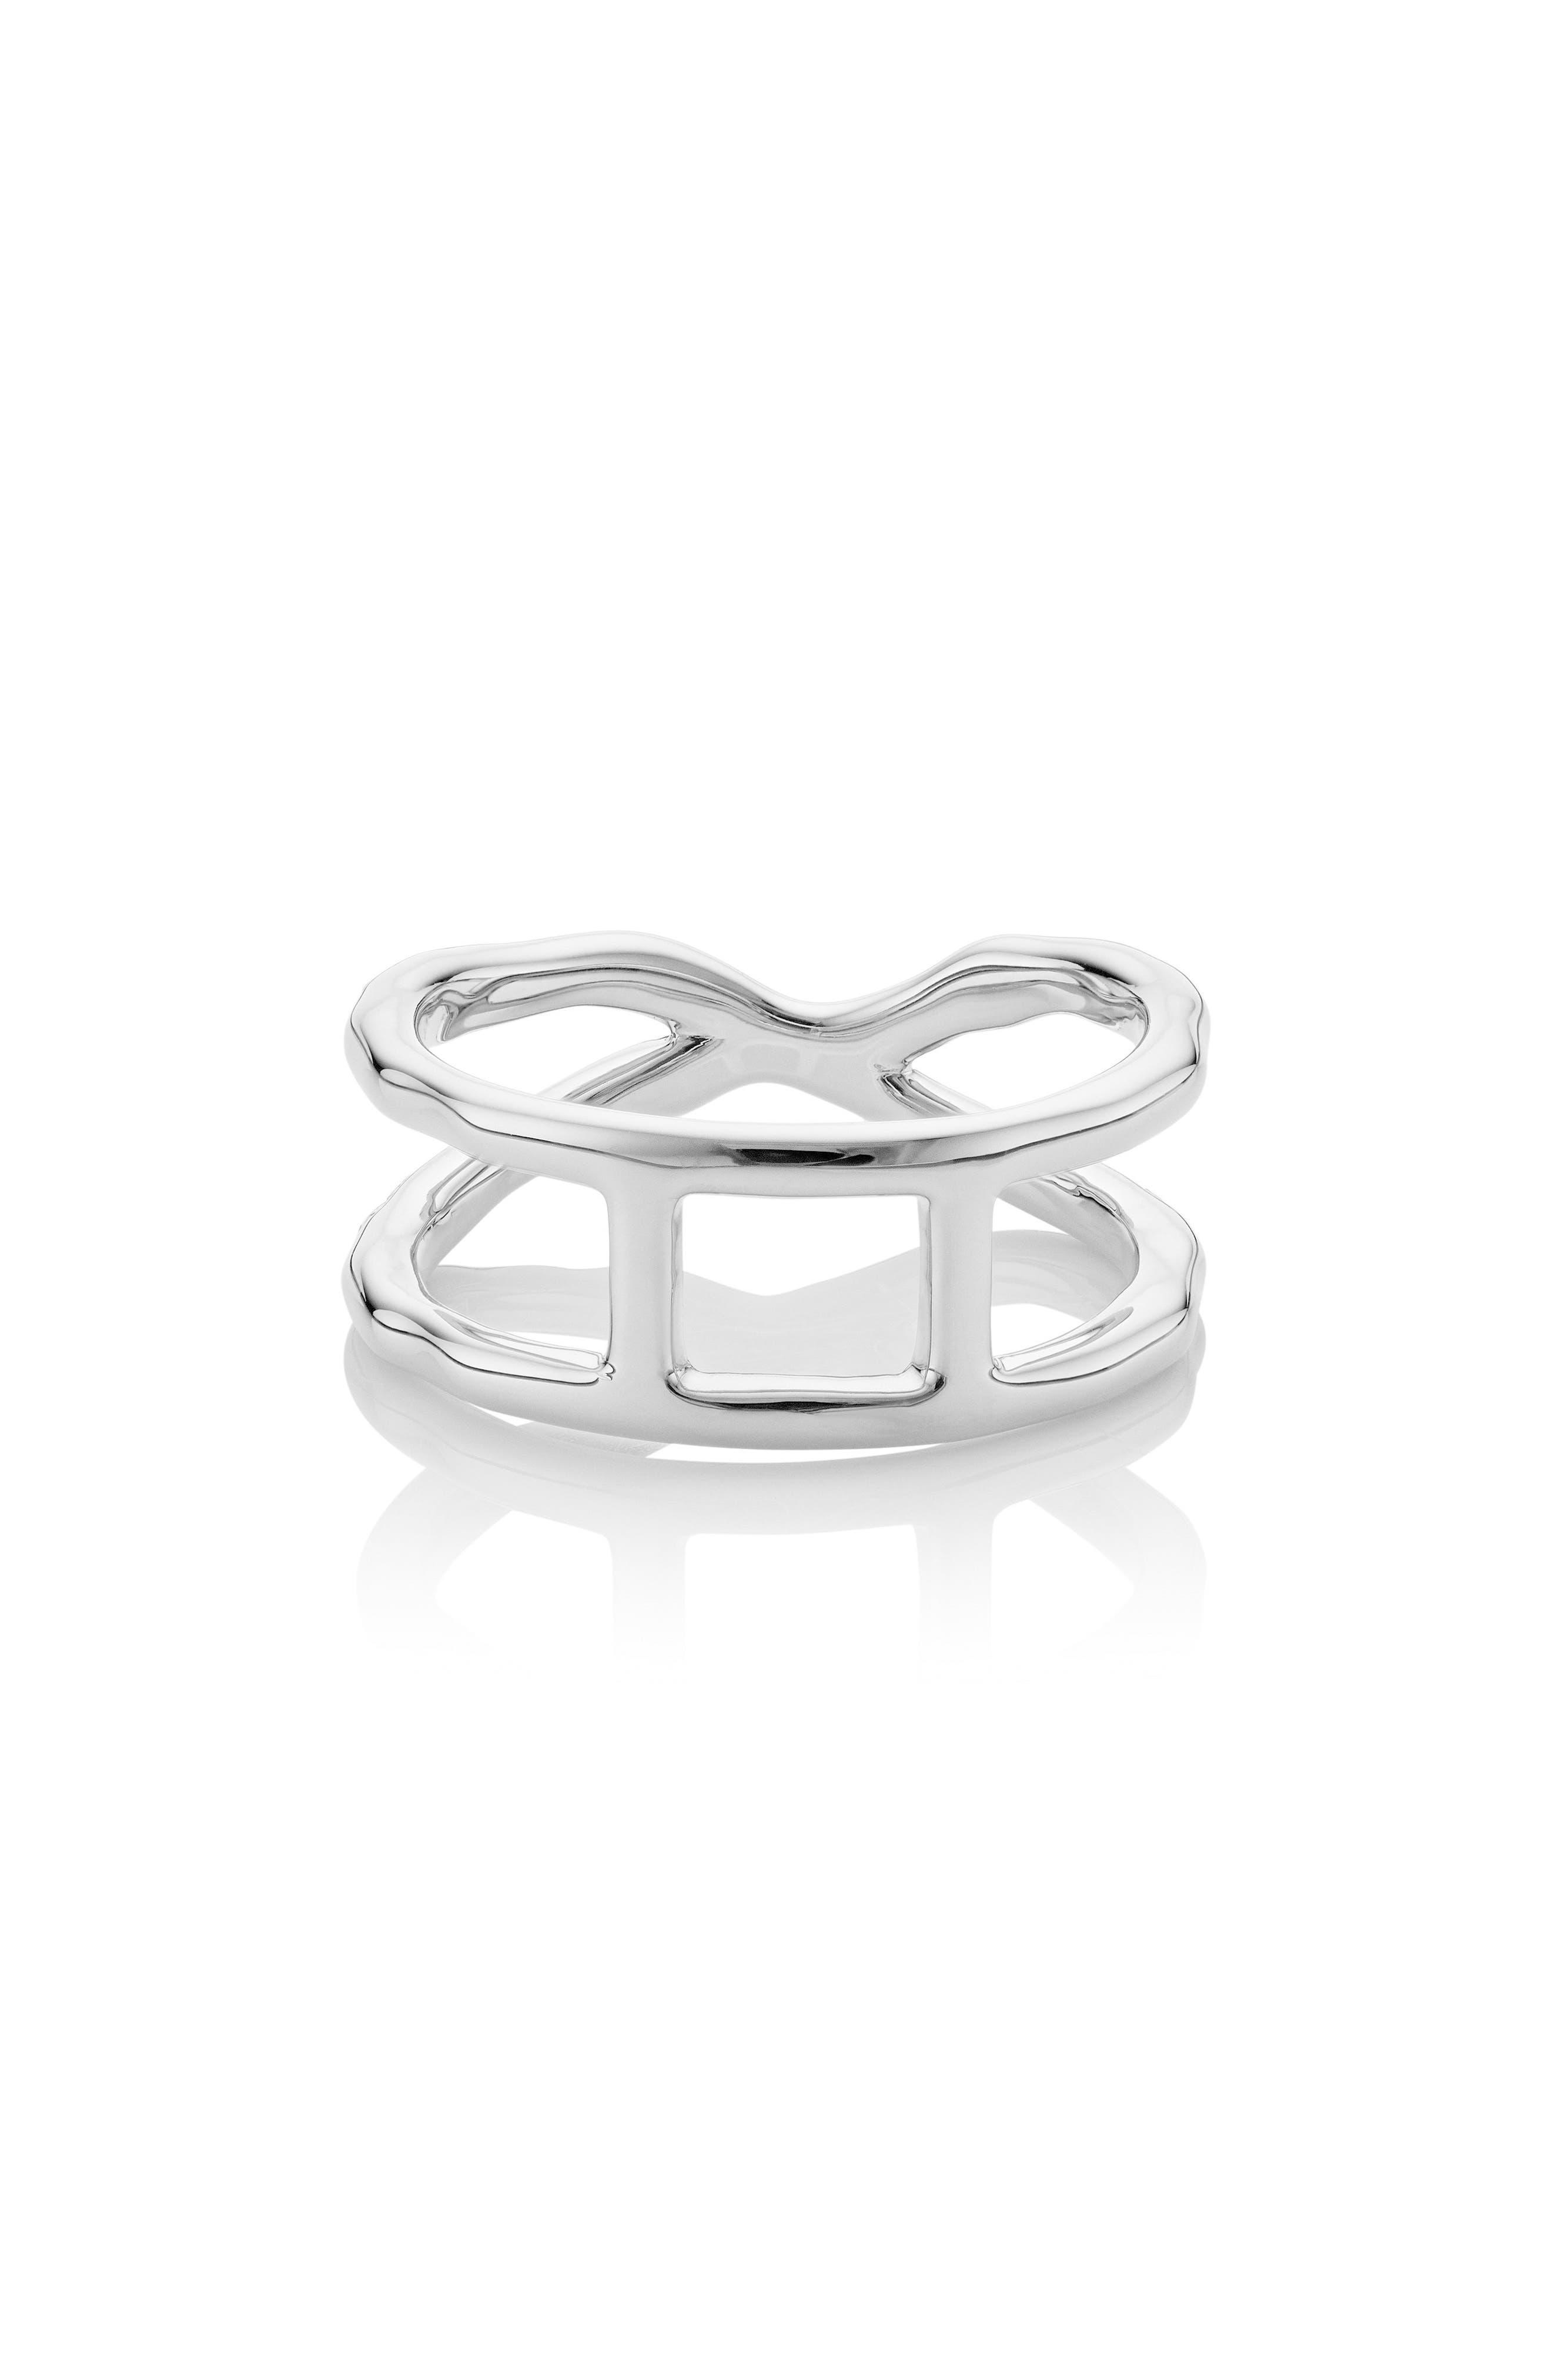 Riva Diamond Ring,                             Alternate thumbnail 2, color,                             Silver/ Diamond